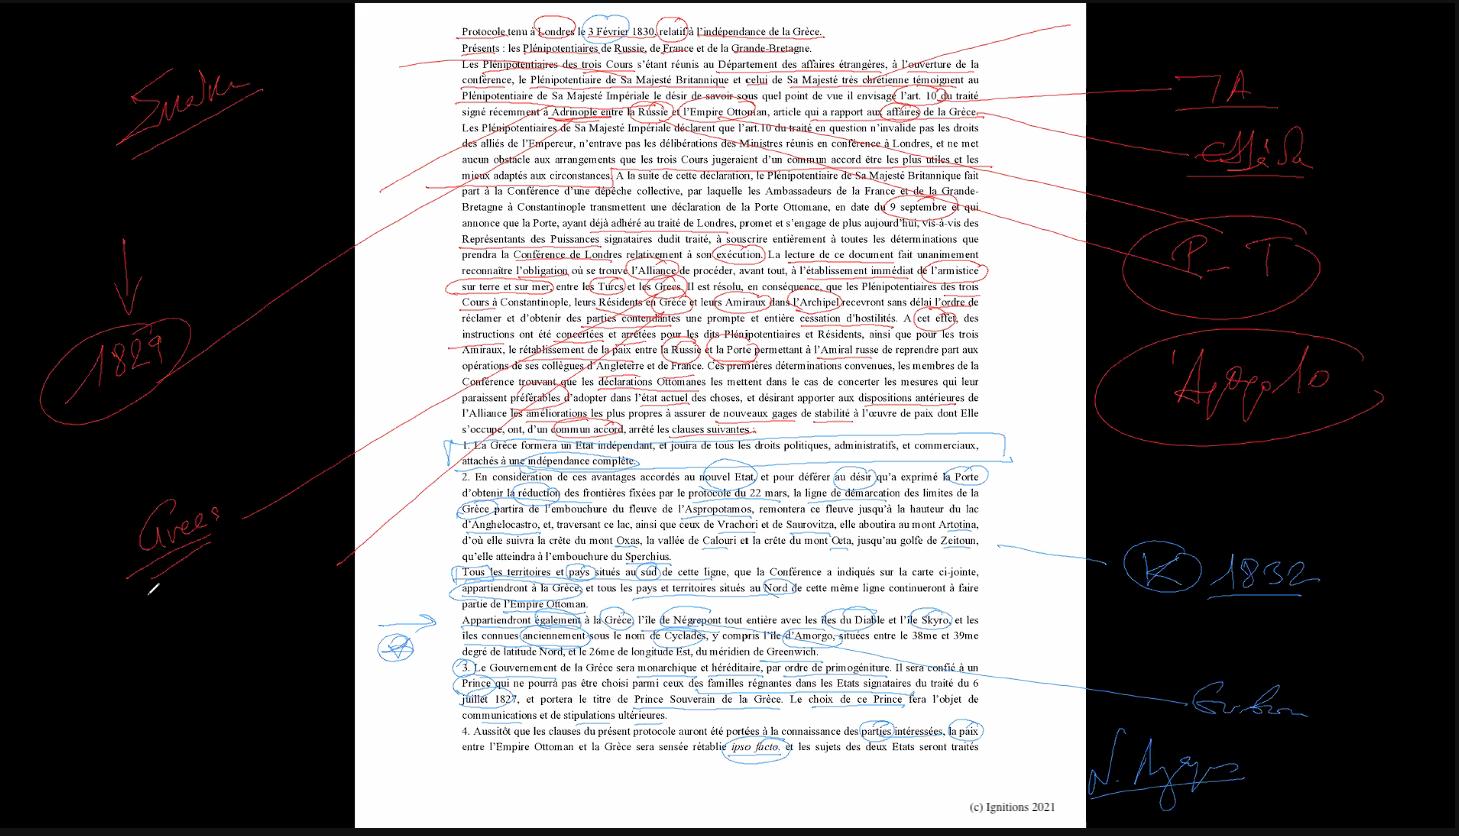 58953 - II - e-Masterclass: Επαναστατικές Συνθήκες. (Dessin)